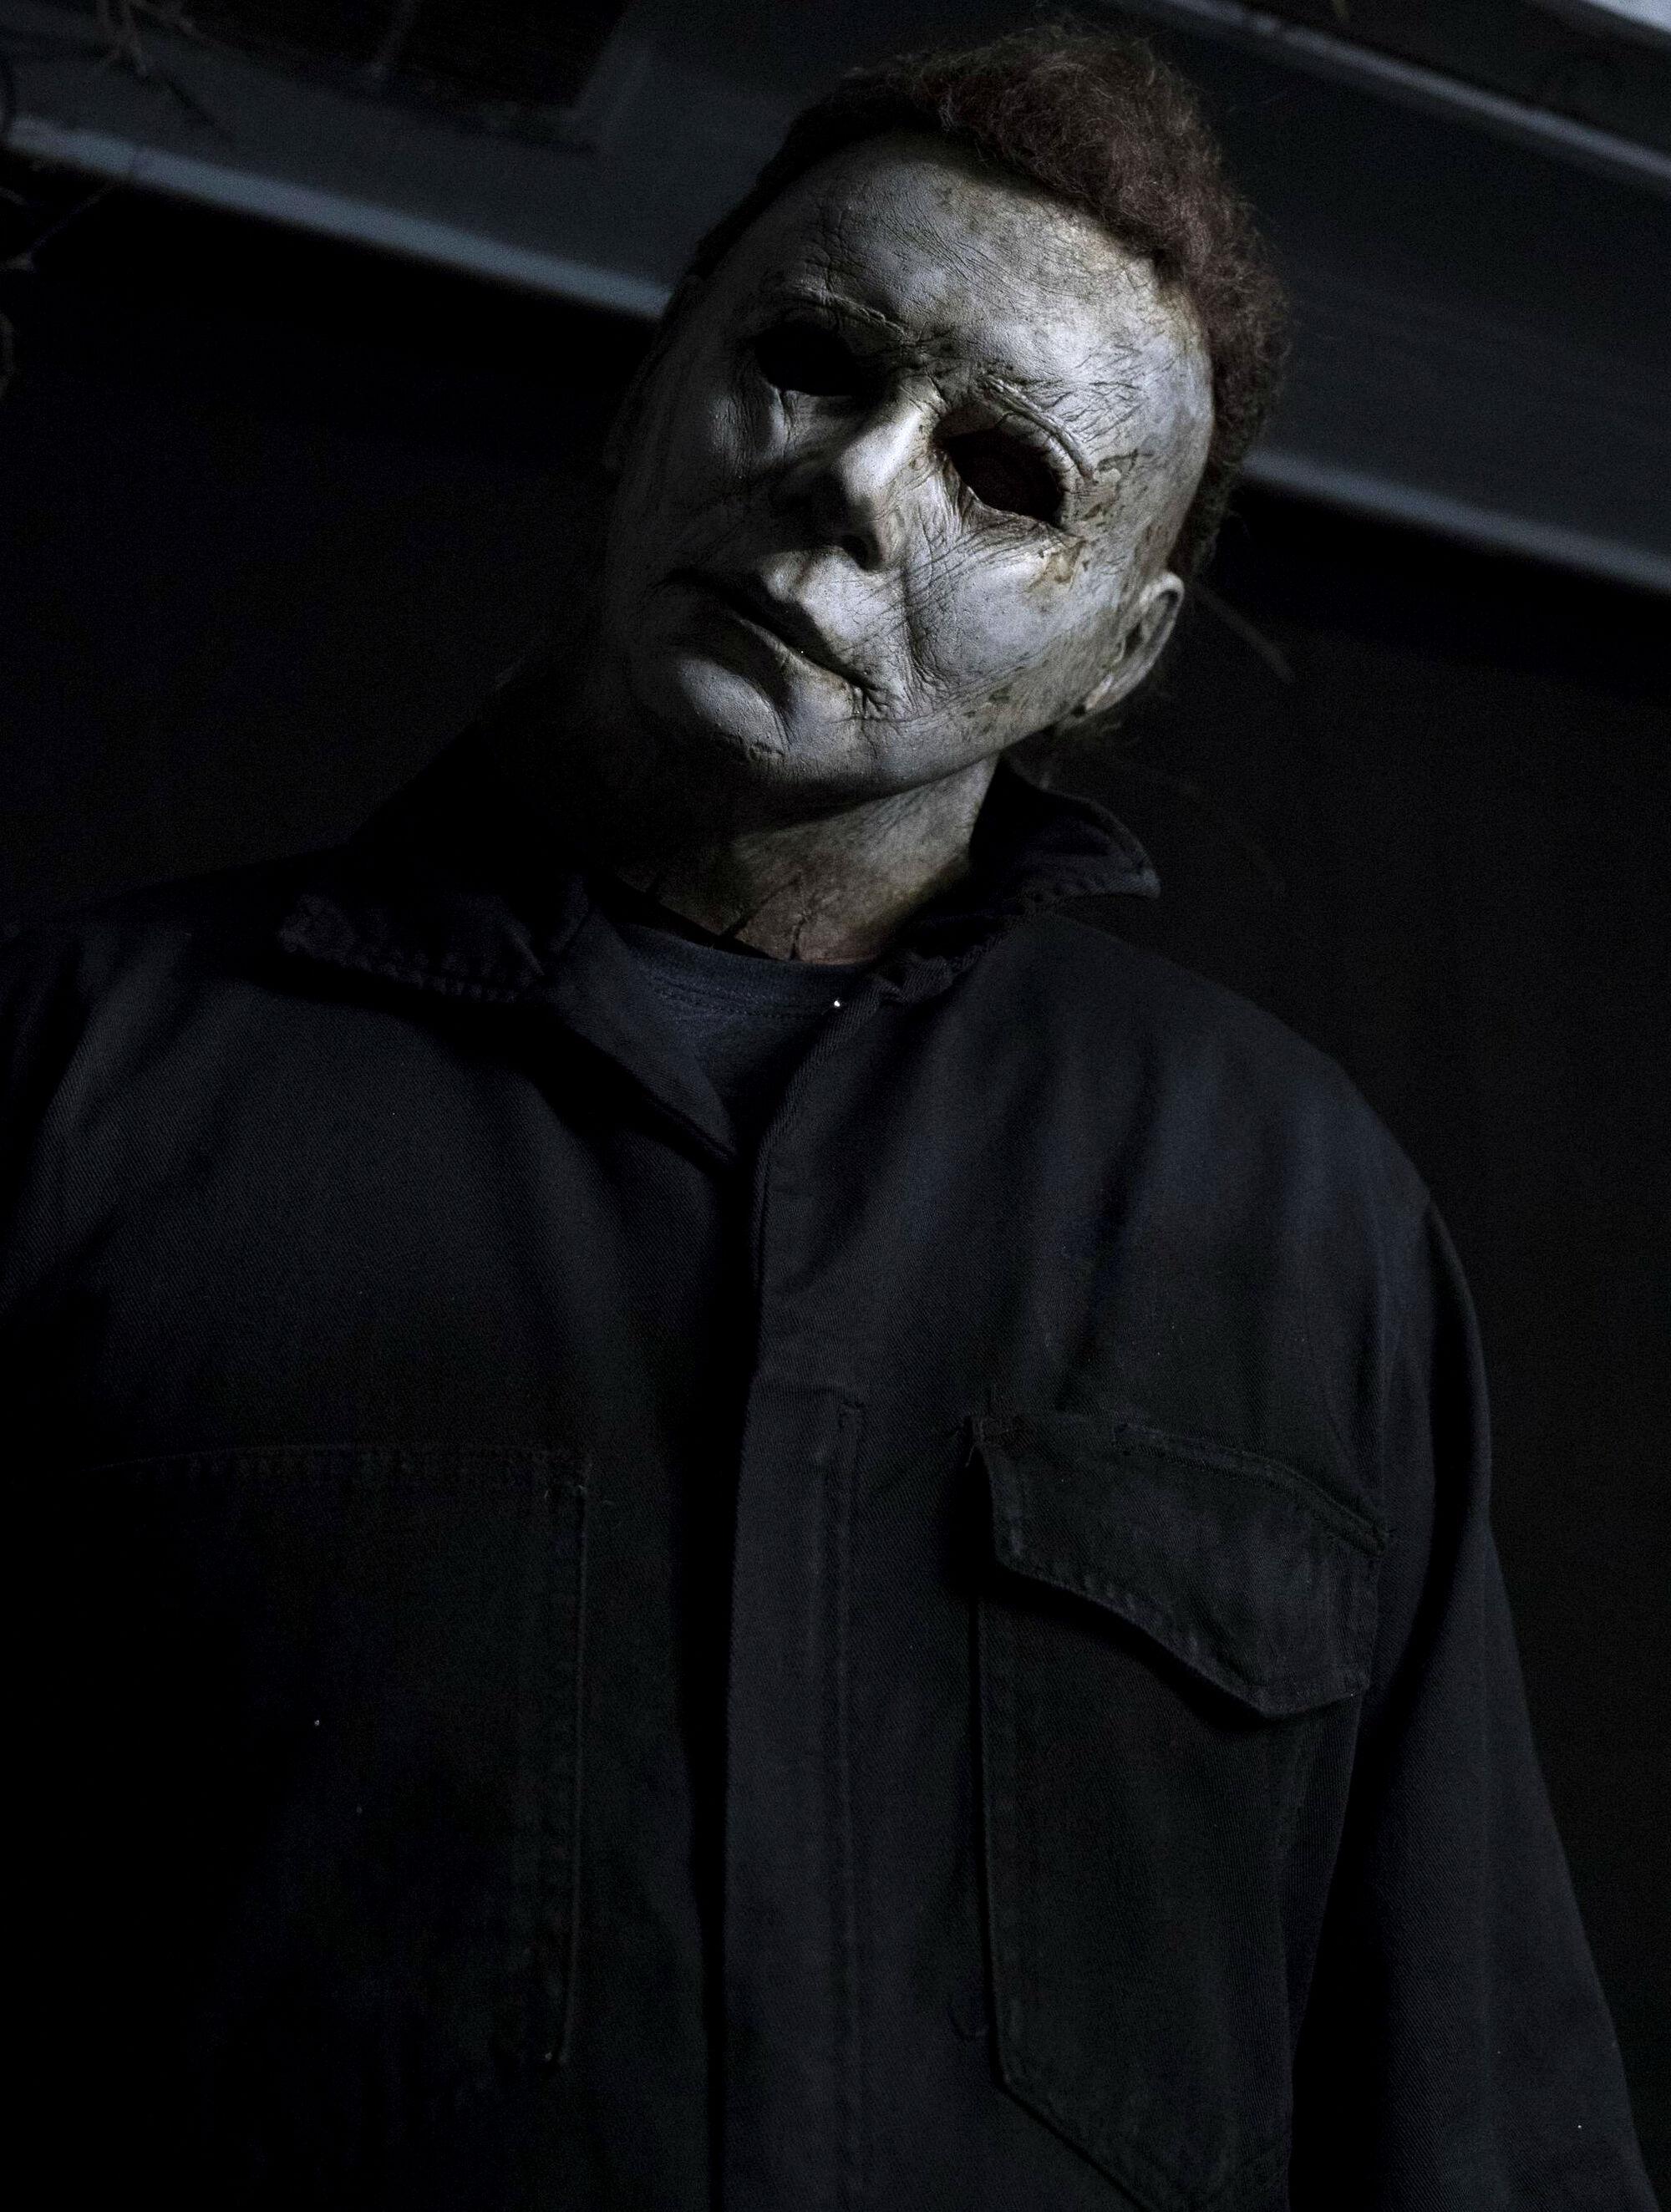 Michael Myers | Villains Wiki | FANDOM powered by Wikia on